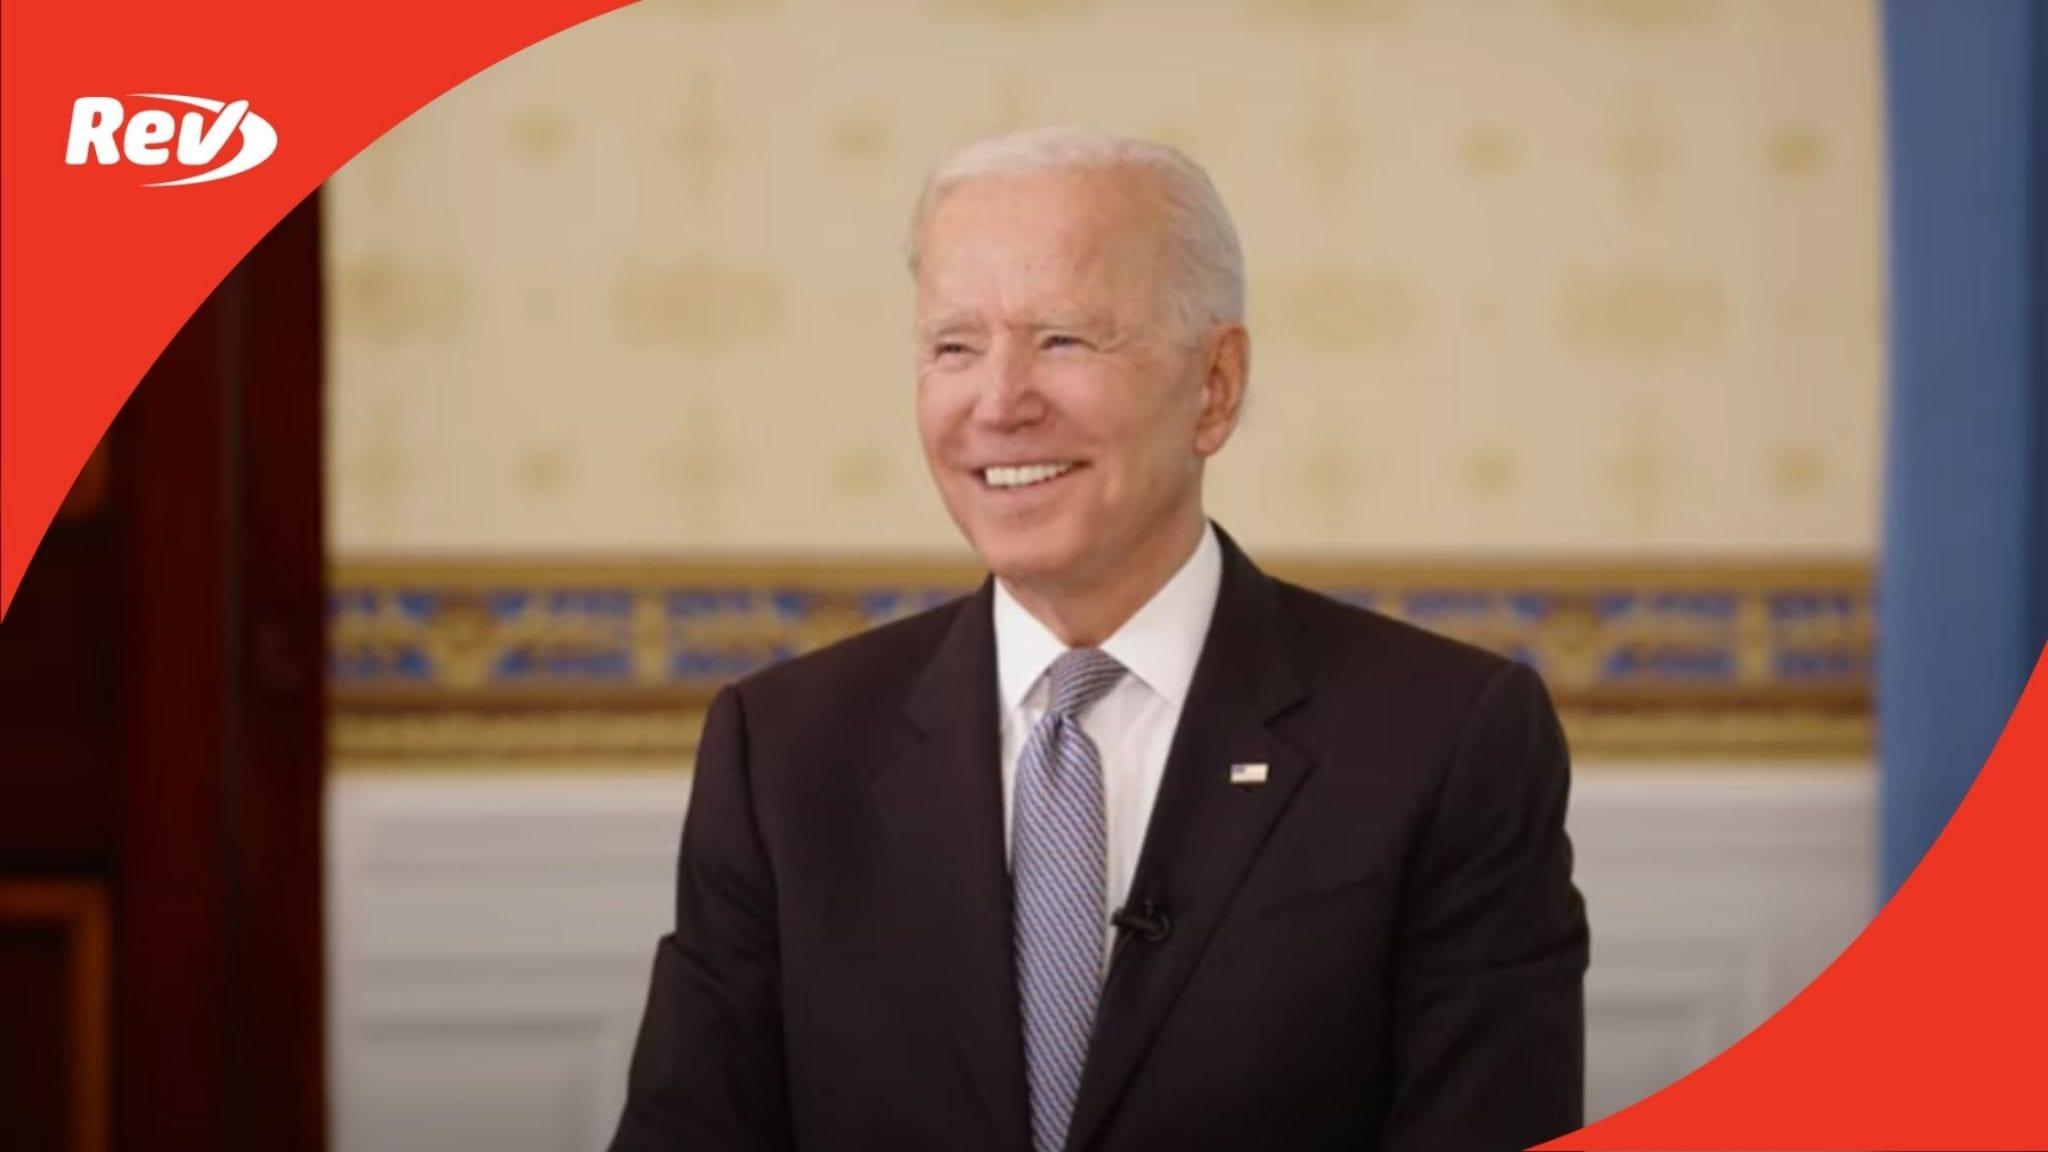 Joe Biden & Dr. Fauci COVID-19 Vaccine YouTube Town Hall Transcript